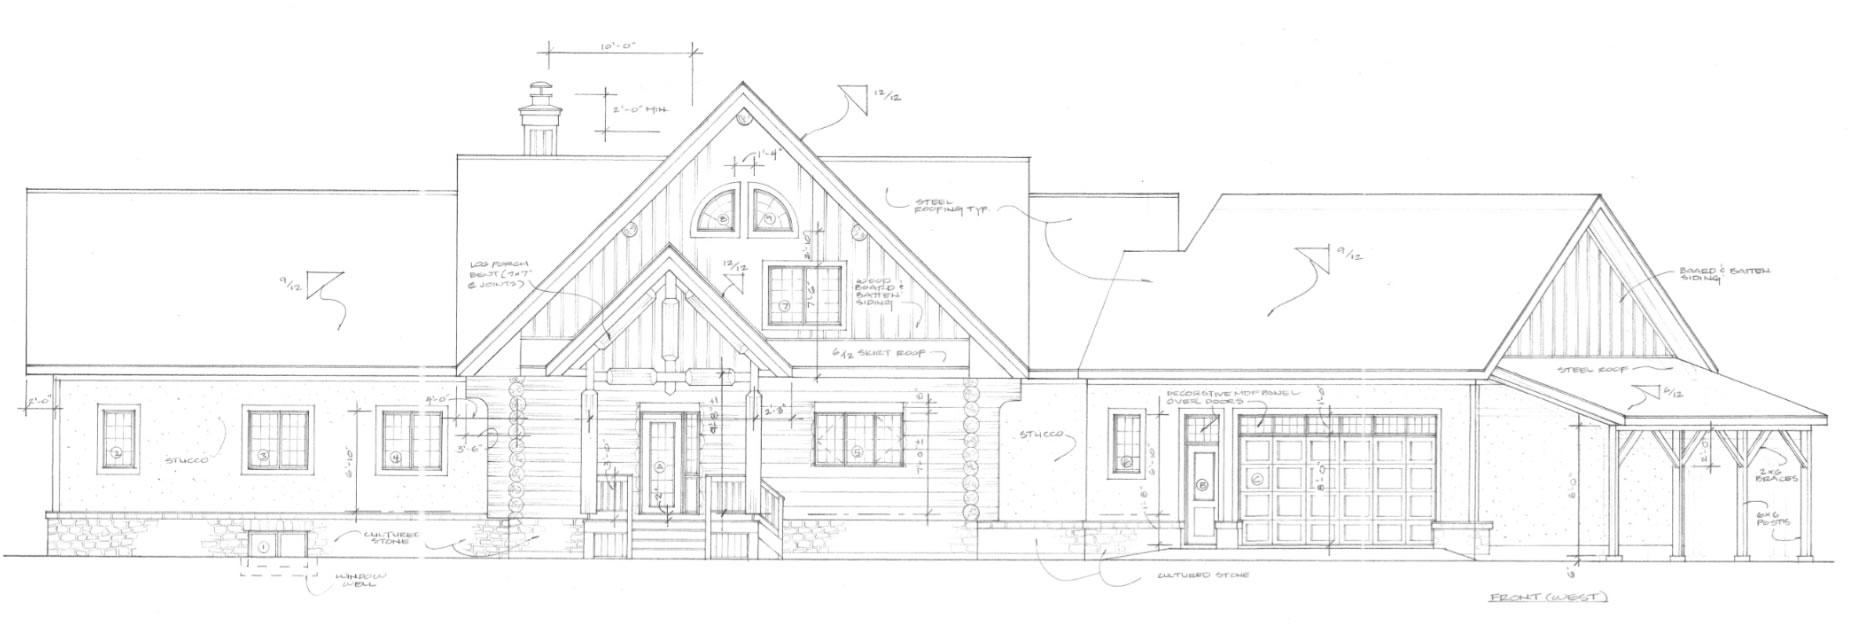 Classic log home elevation